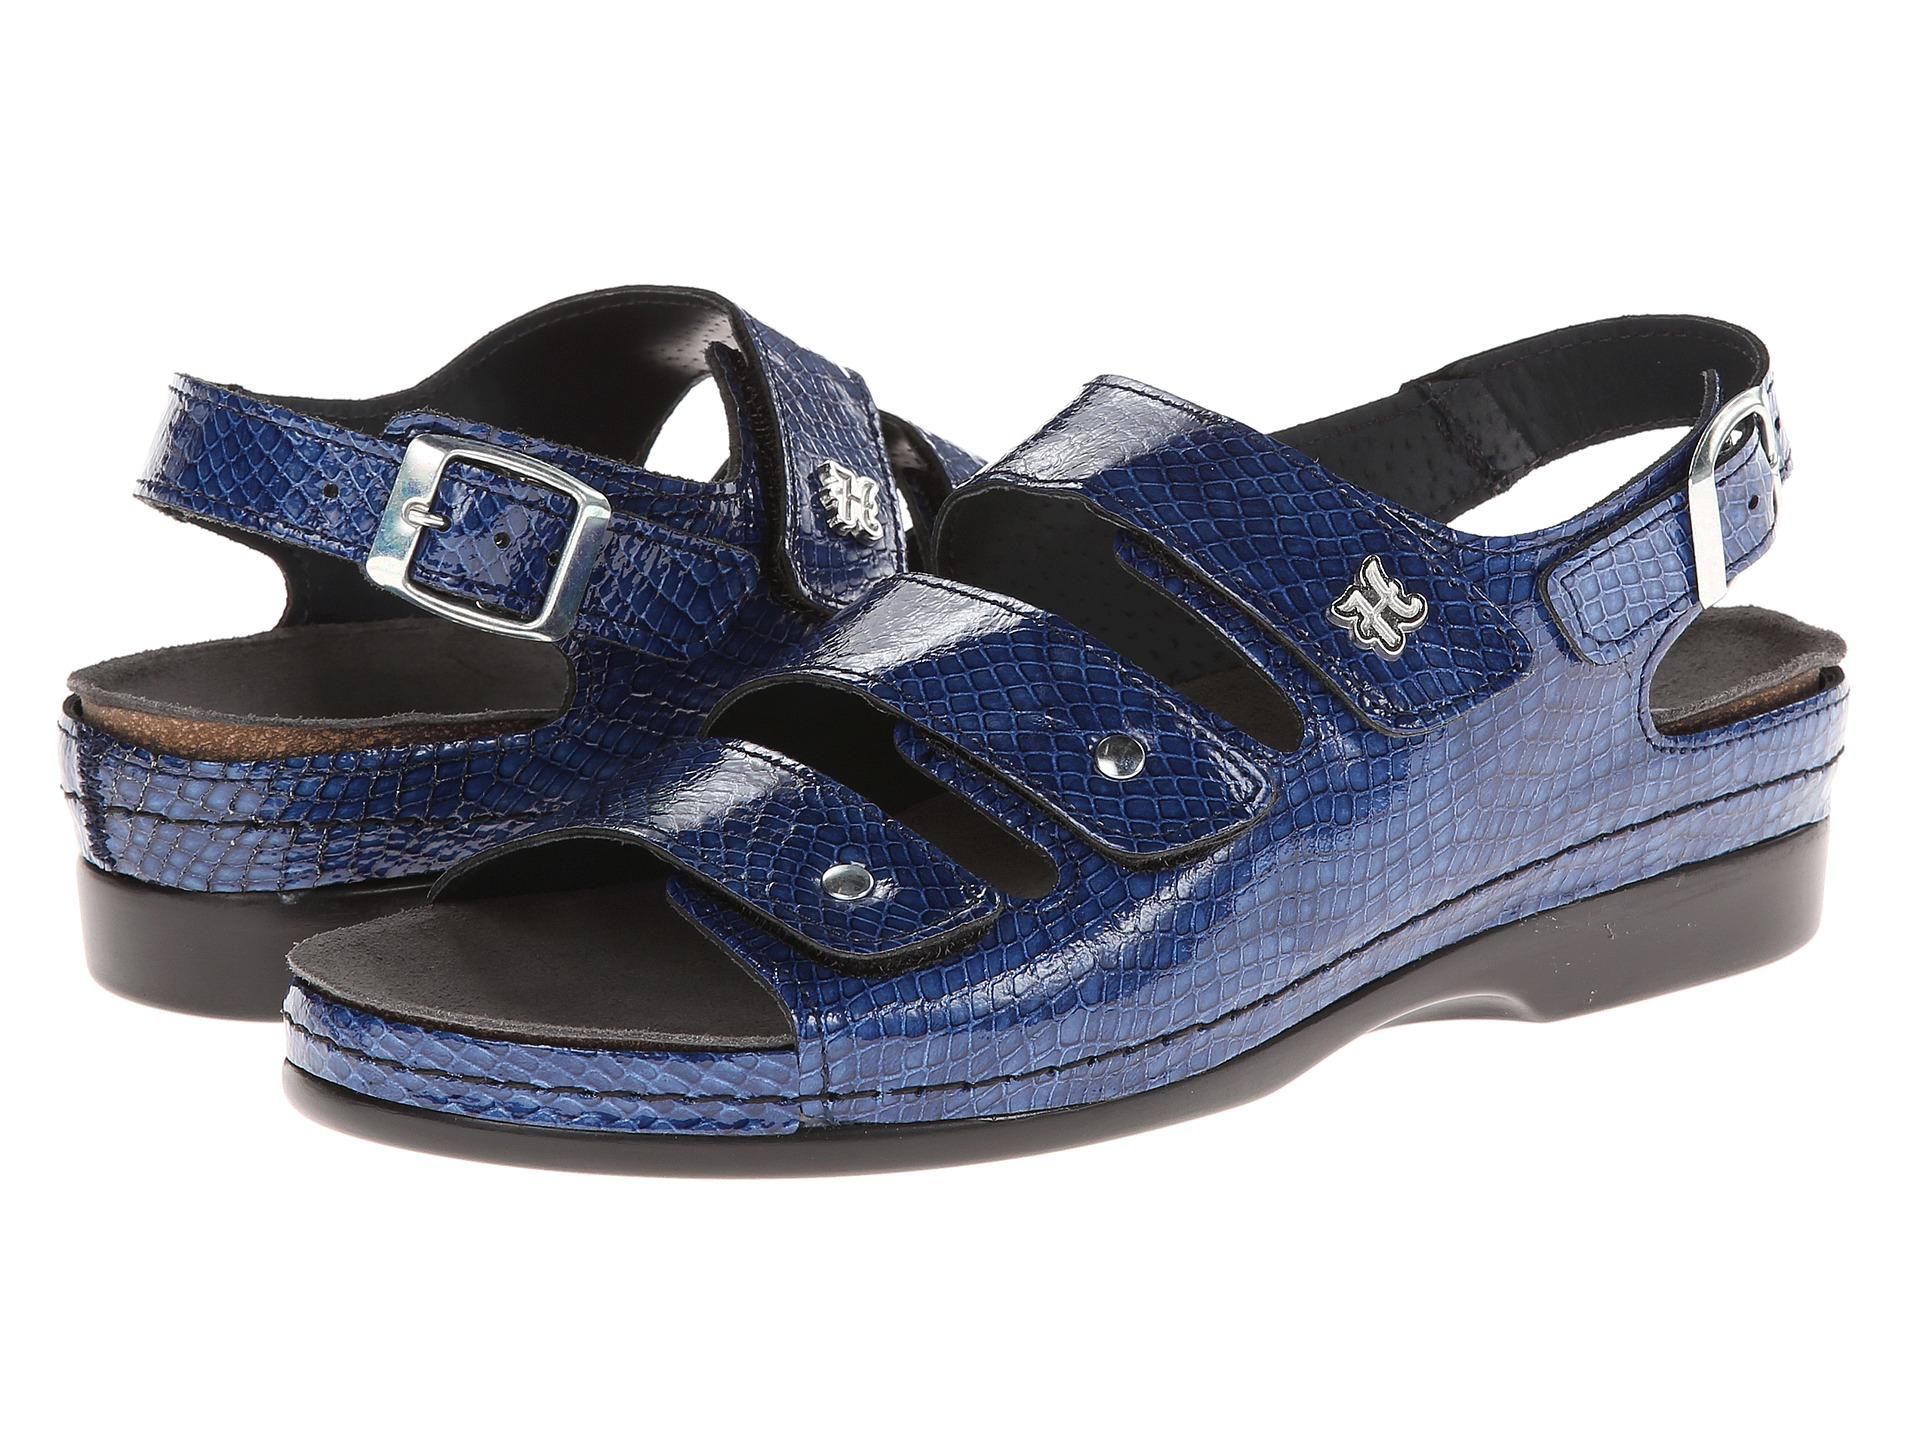 helle kadriye black slide women to off discount comforter patent womens sandals shoes up com c comfort esport ltf